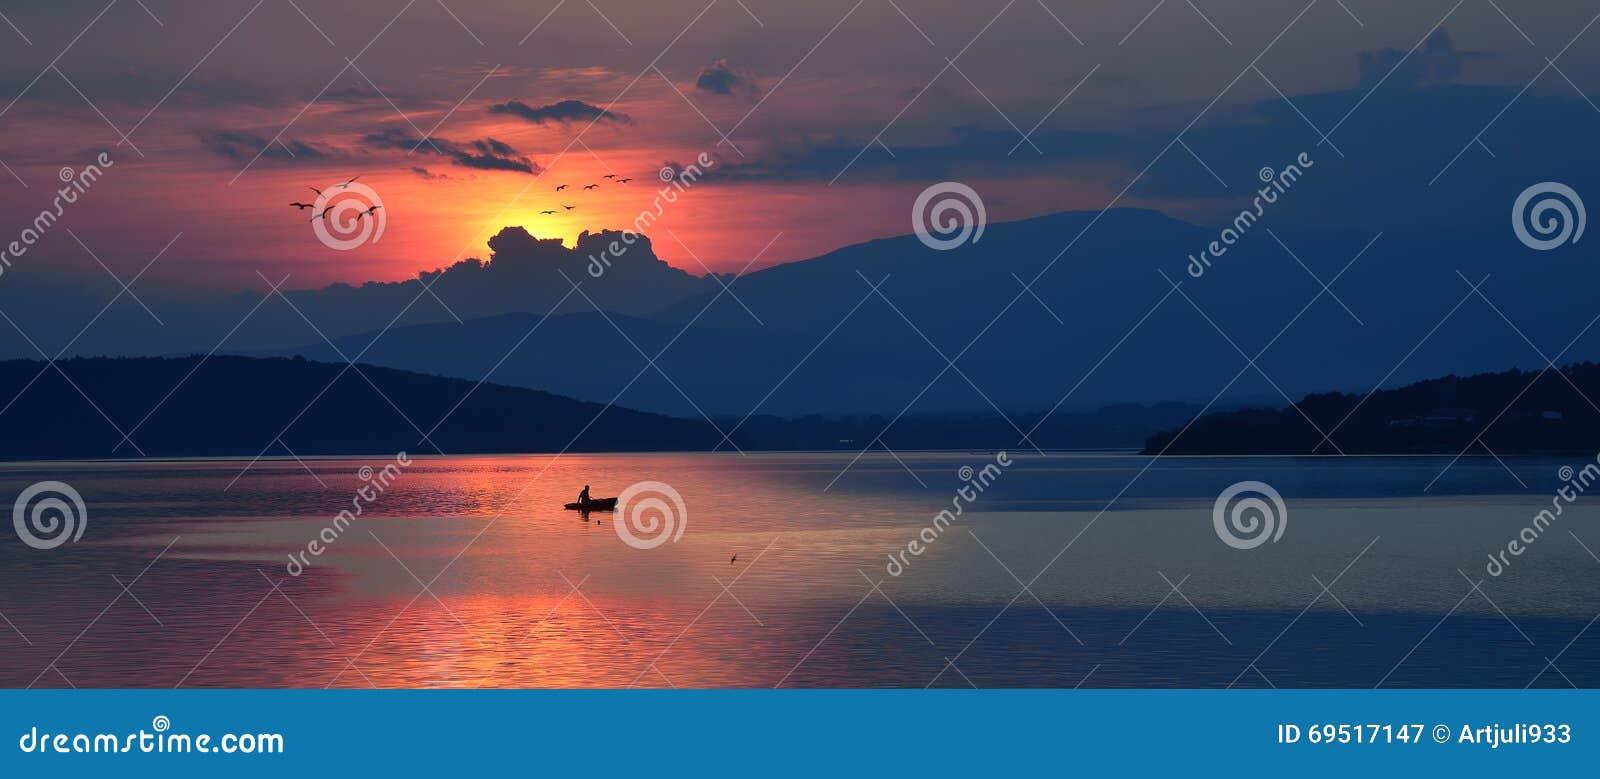 Beautiful Nature Orange Background.Colorful Artistic Wallpaper.Sunset,sunrise,clouds,blue sky.Panorama,water landscape.